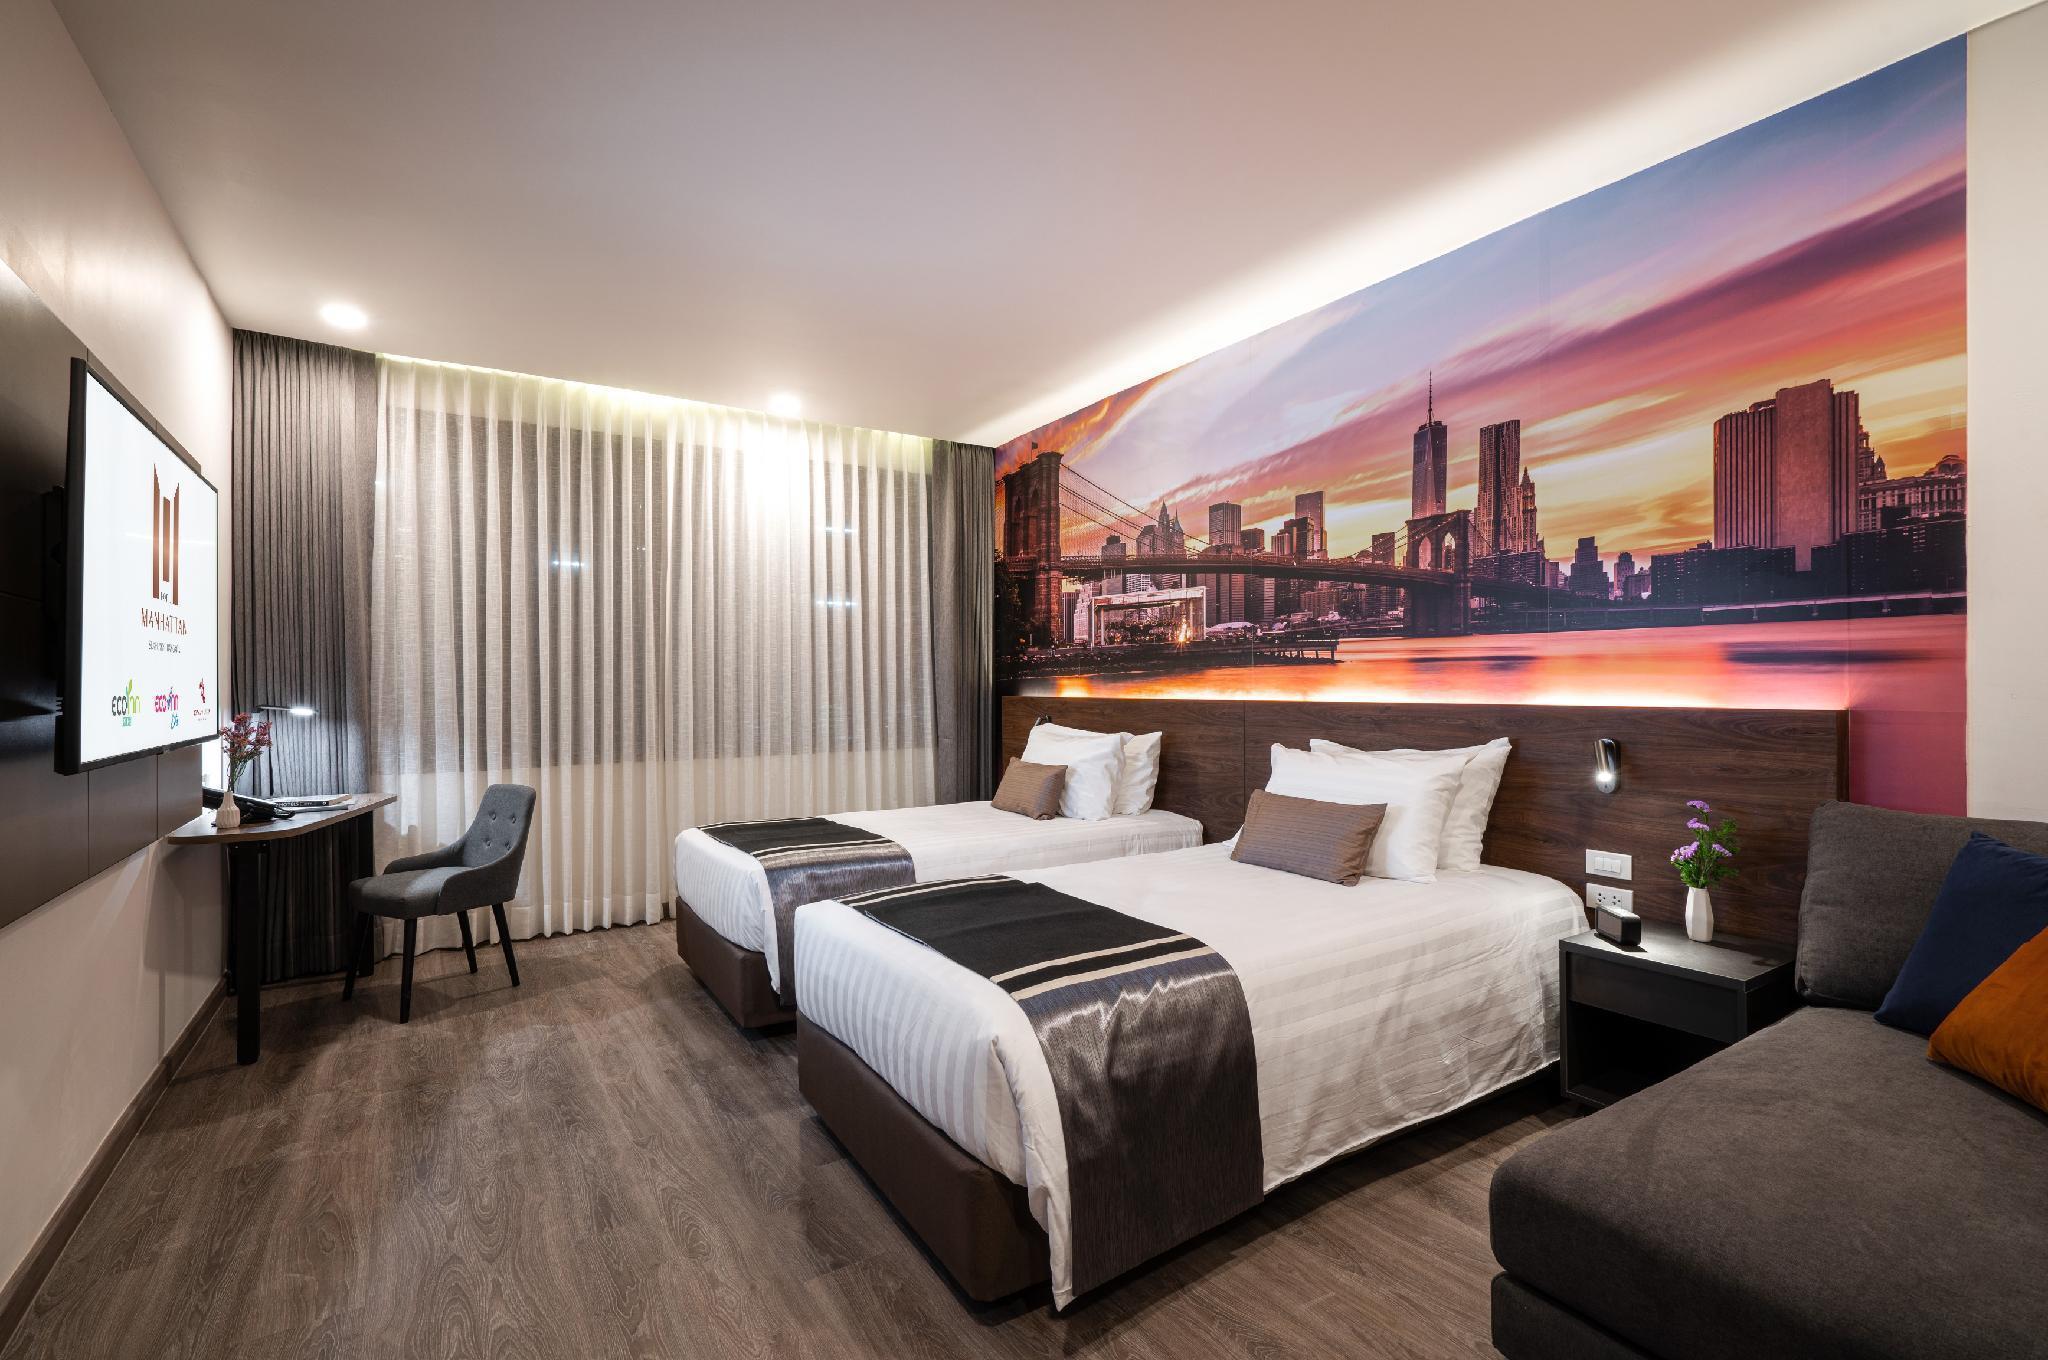 Manhattan Hotel โรงแรมแมนฮัตตัน